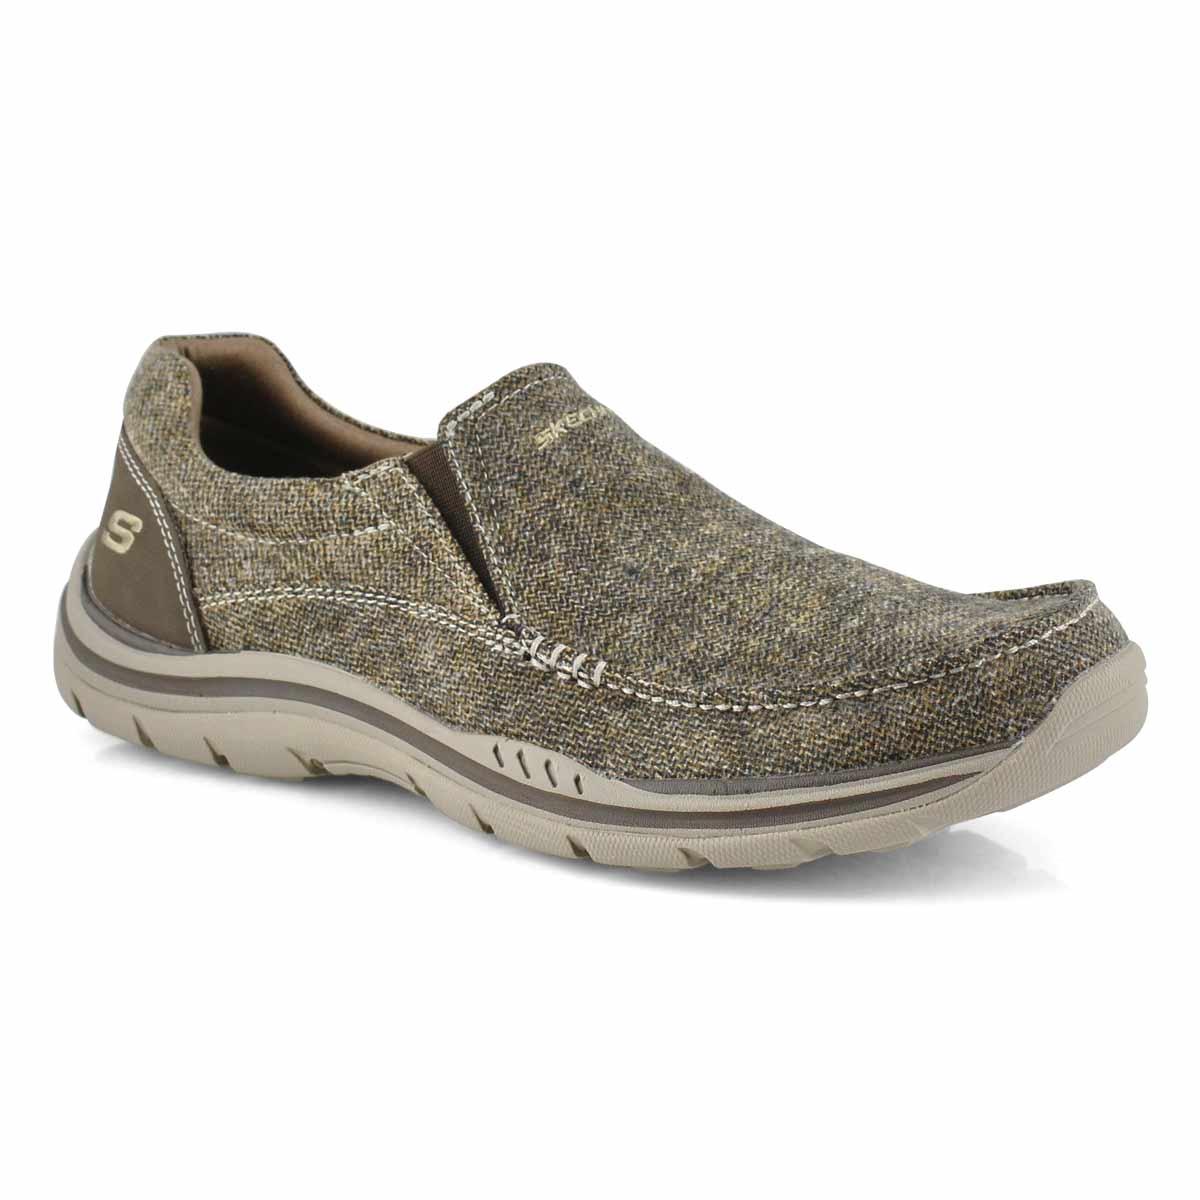 Men's AVILLO dark brown slip on casual shoes